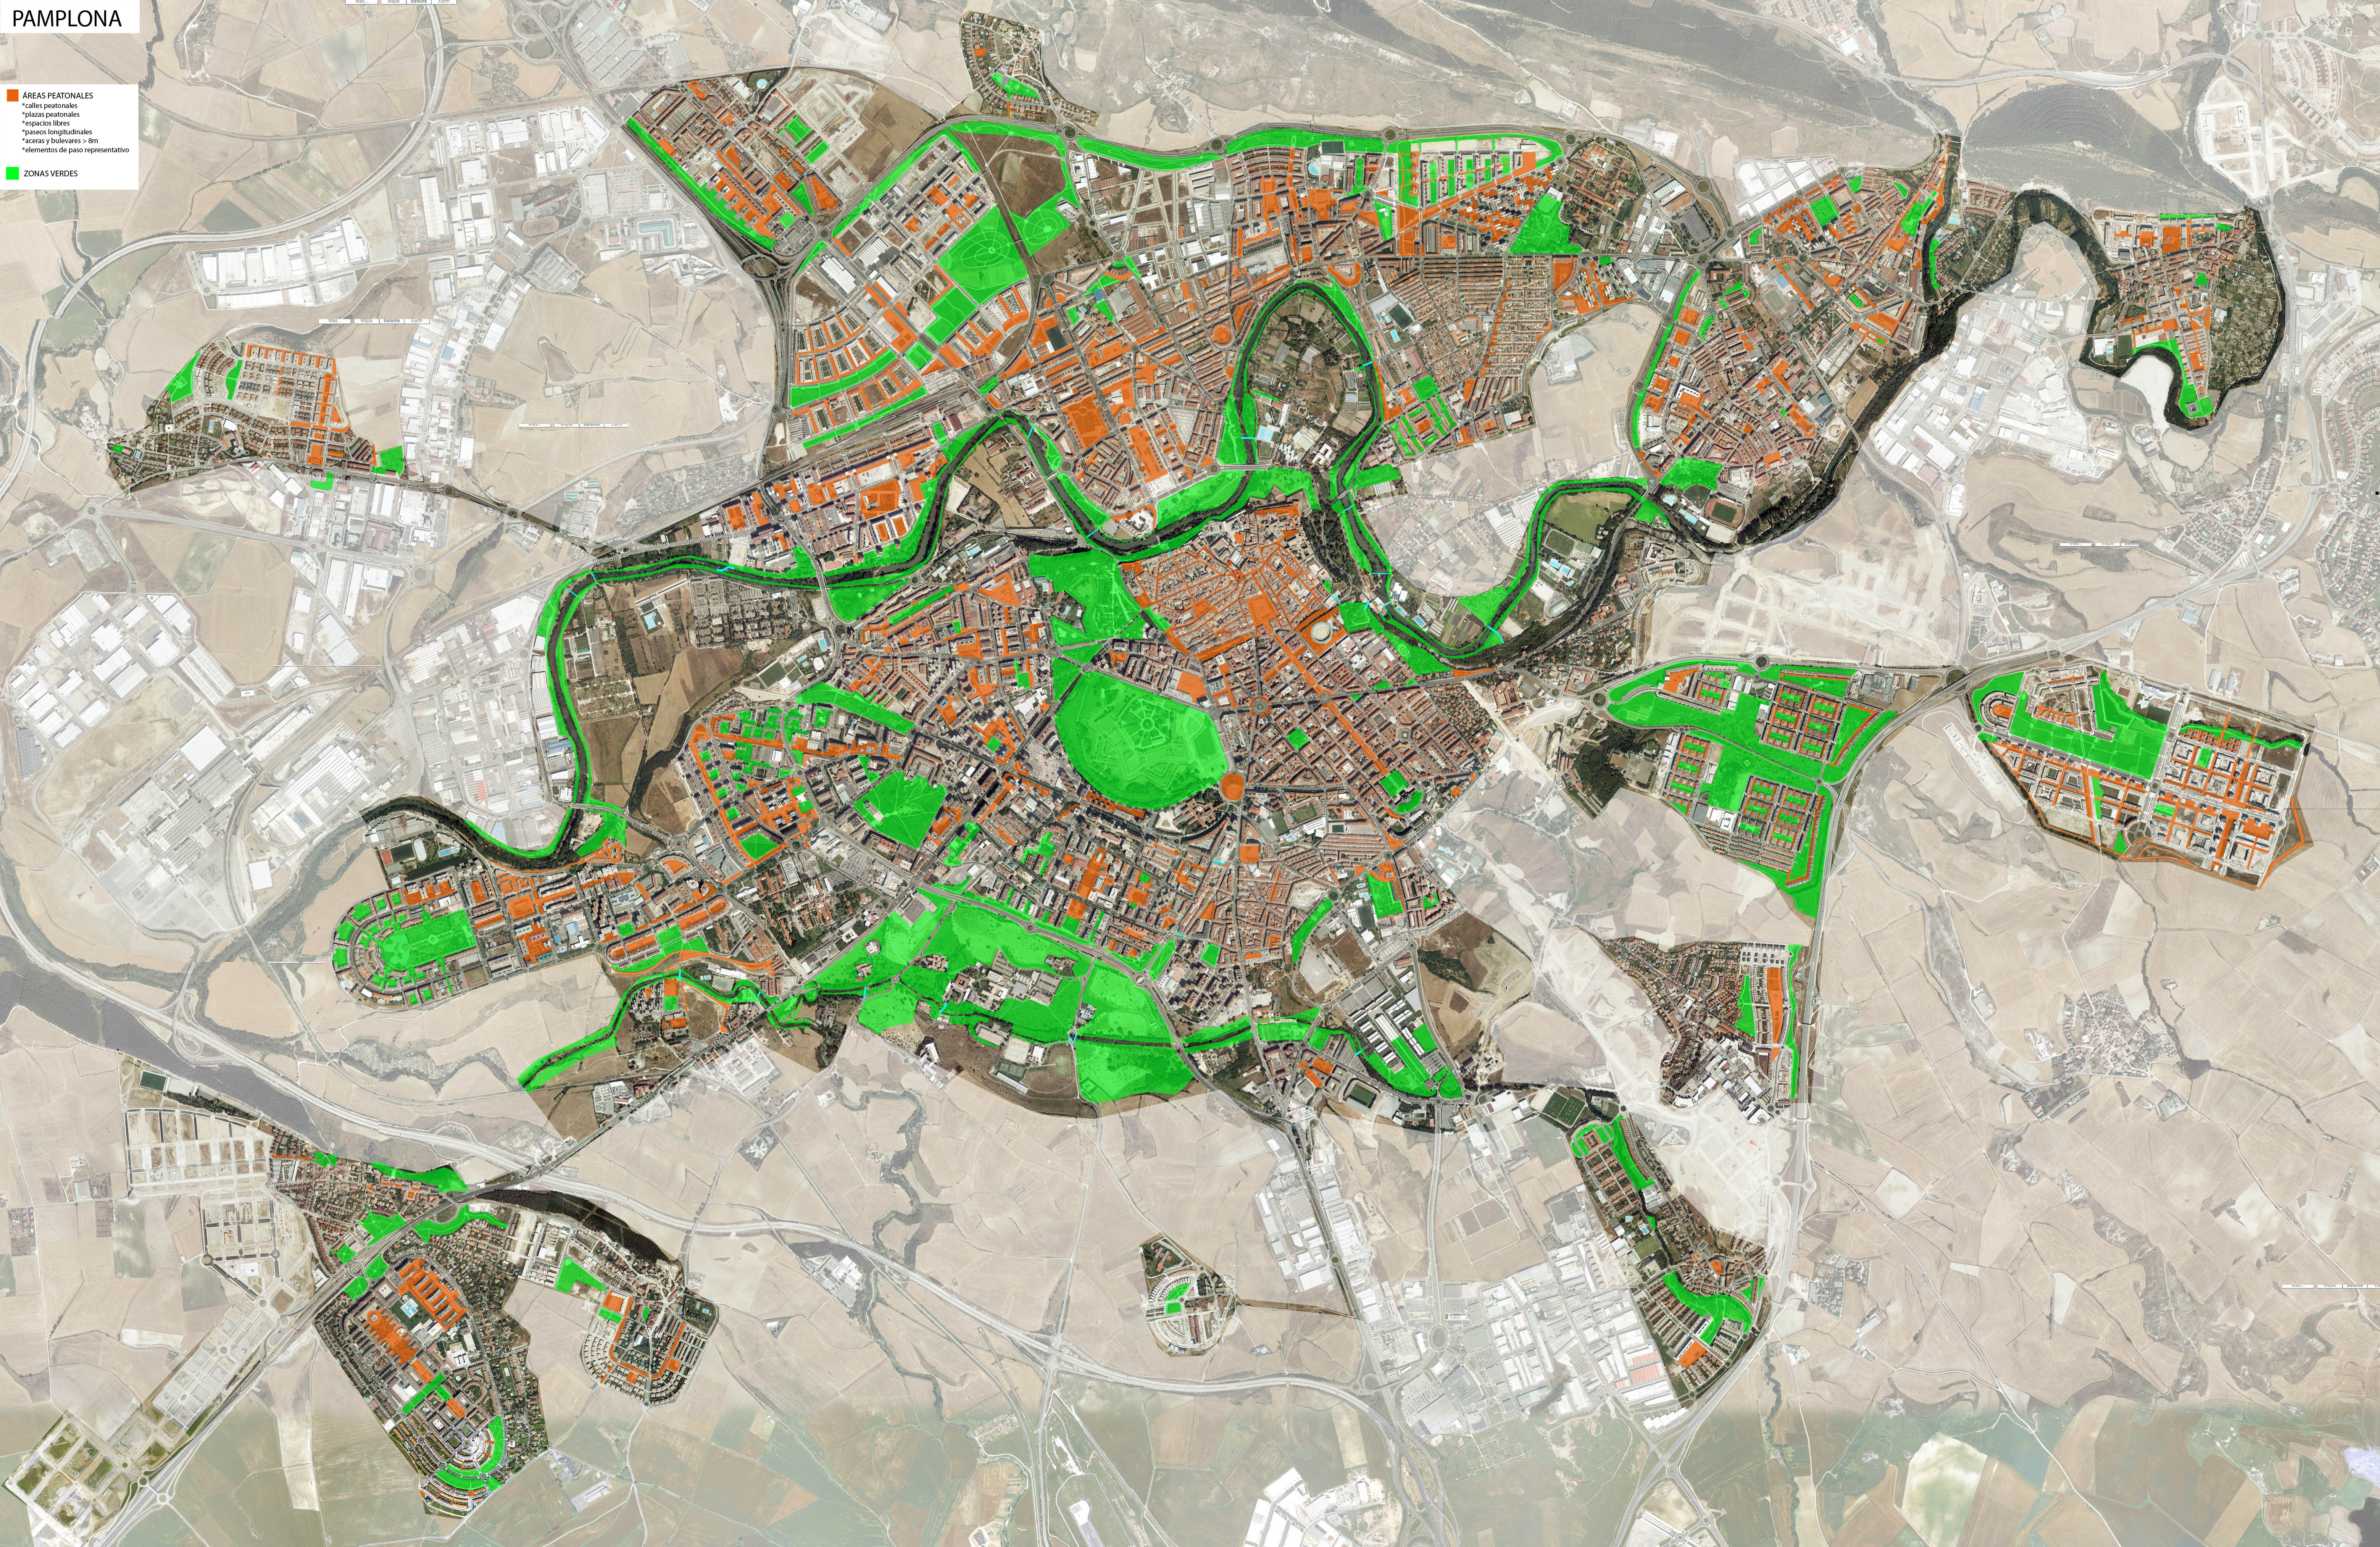 Áreas peatonales de Pamplona